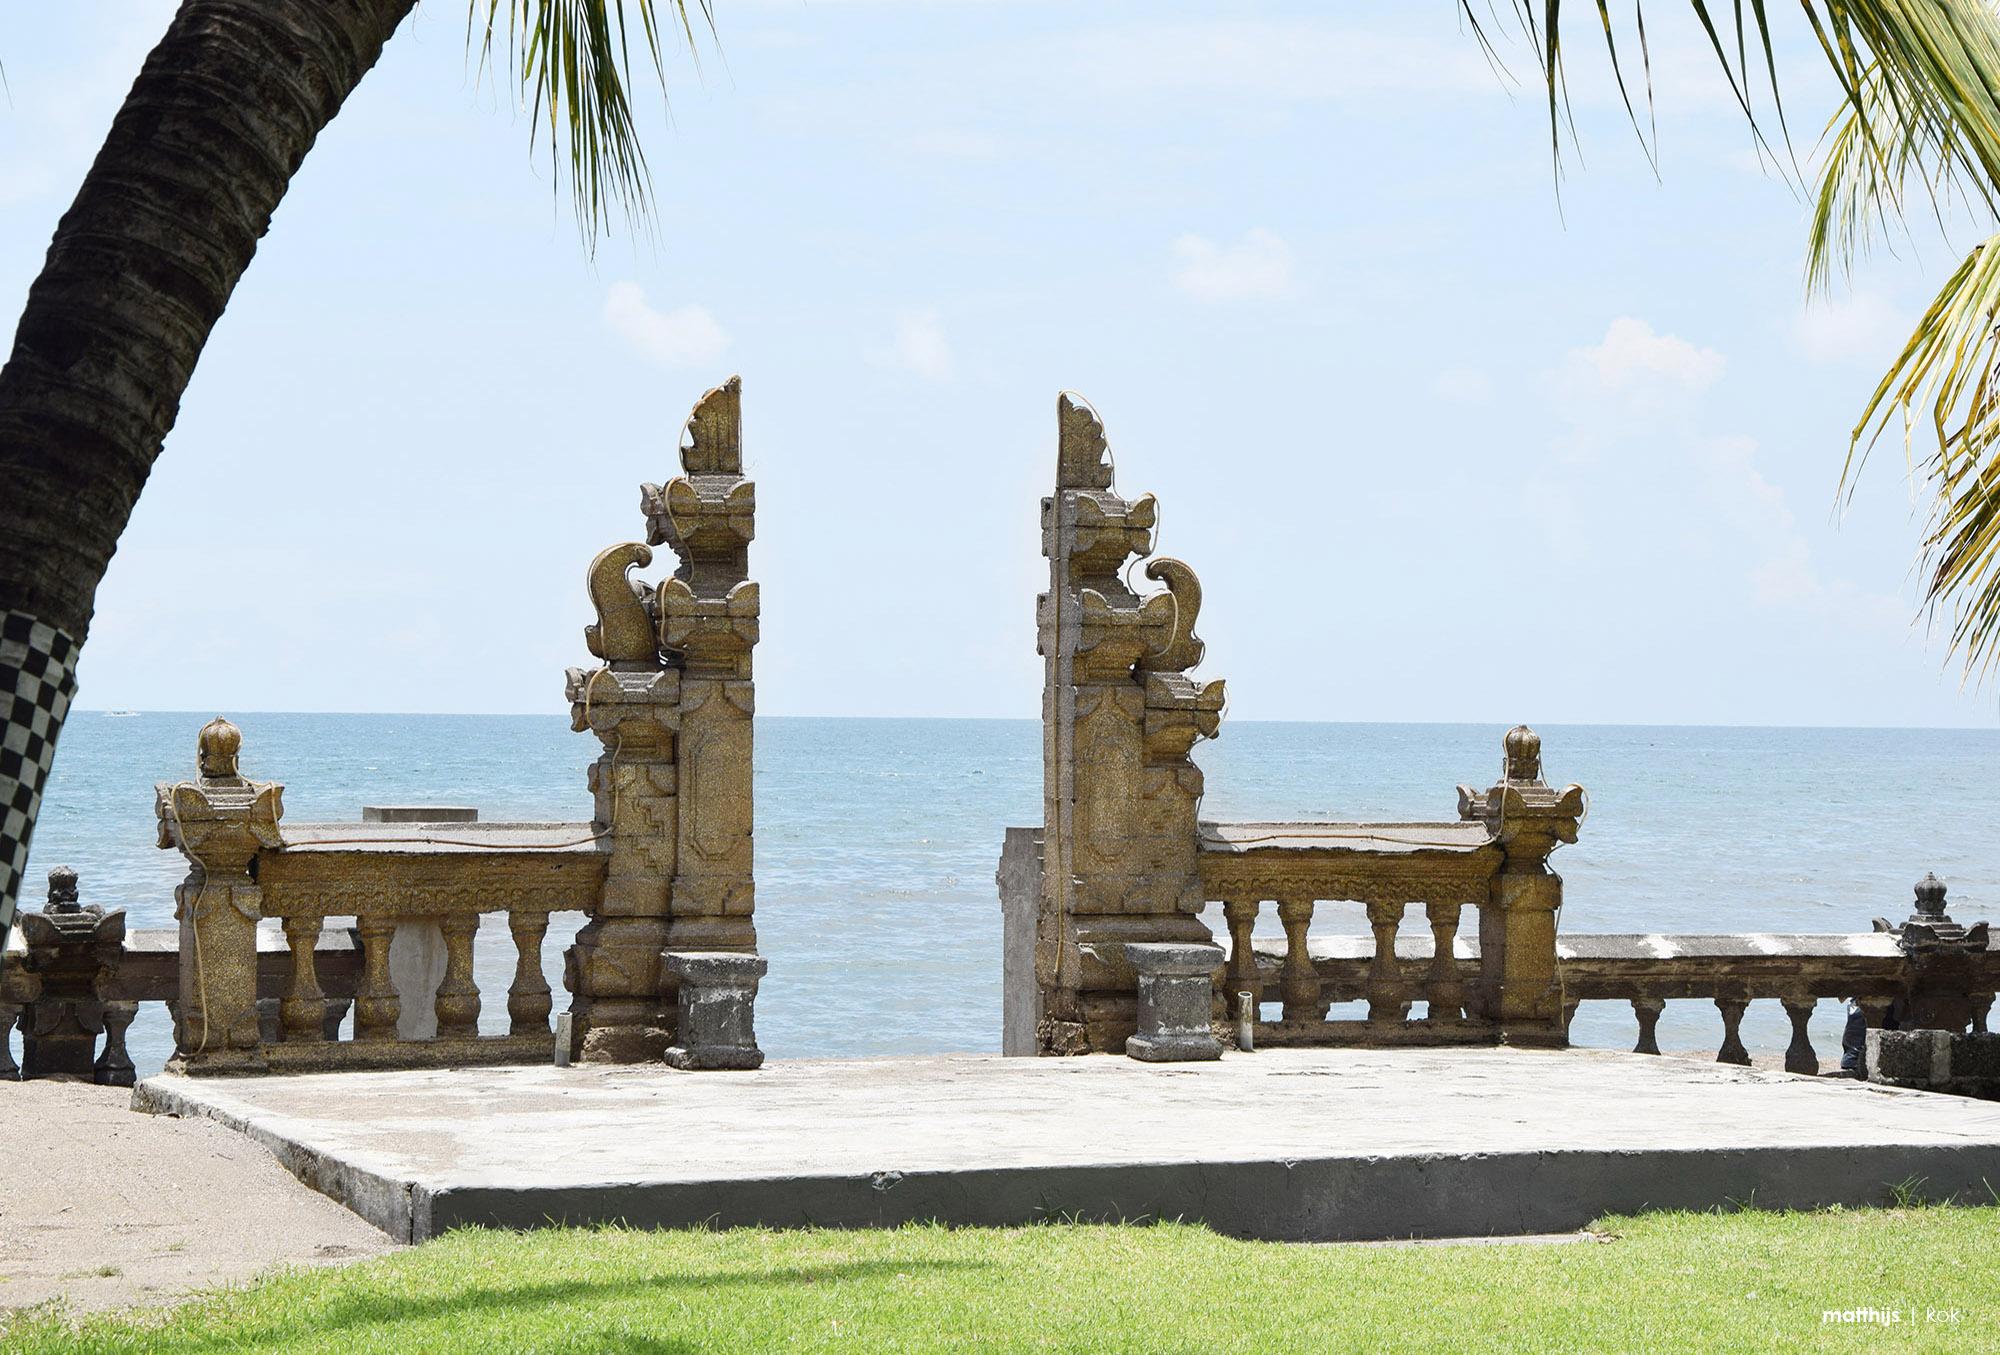 Lovina Beach, Bali | Photo by Matthijs Kok